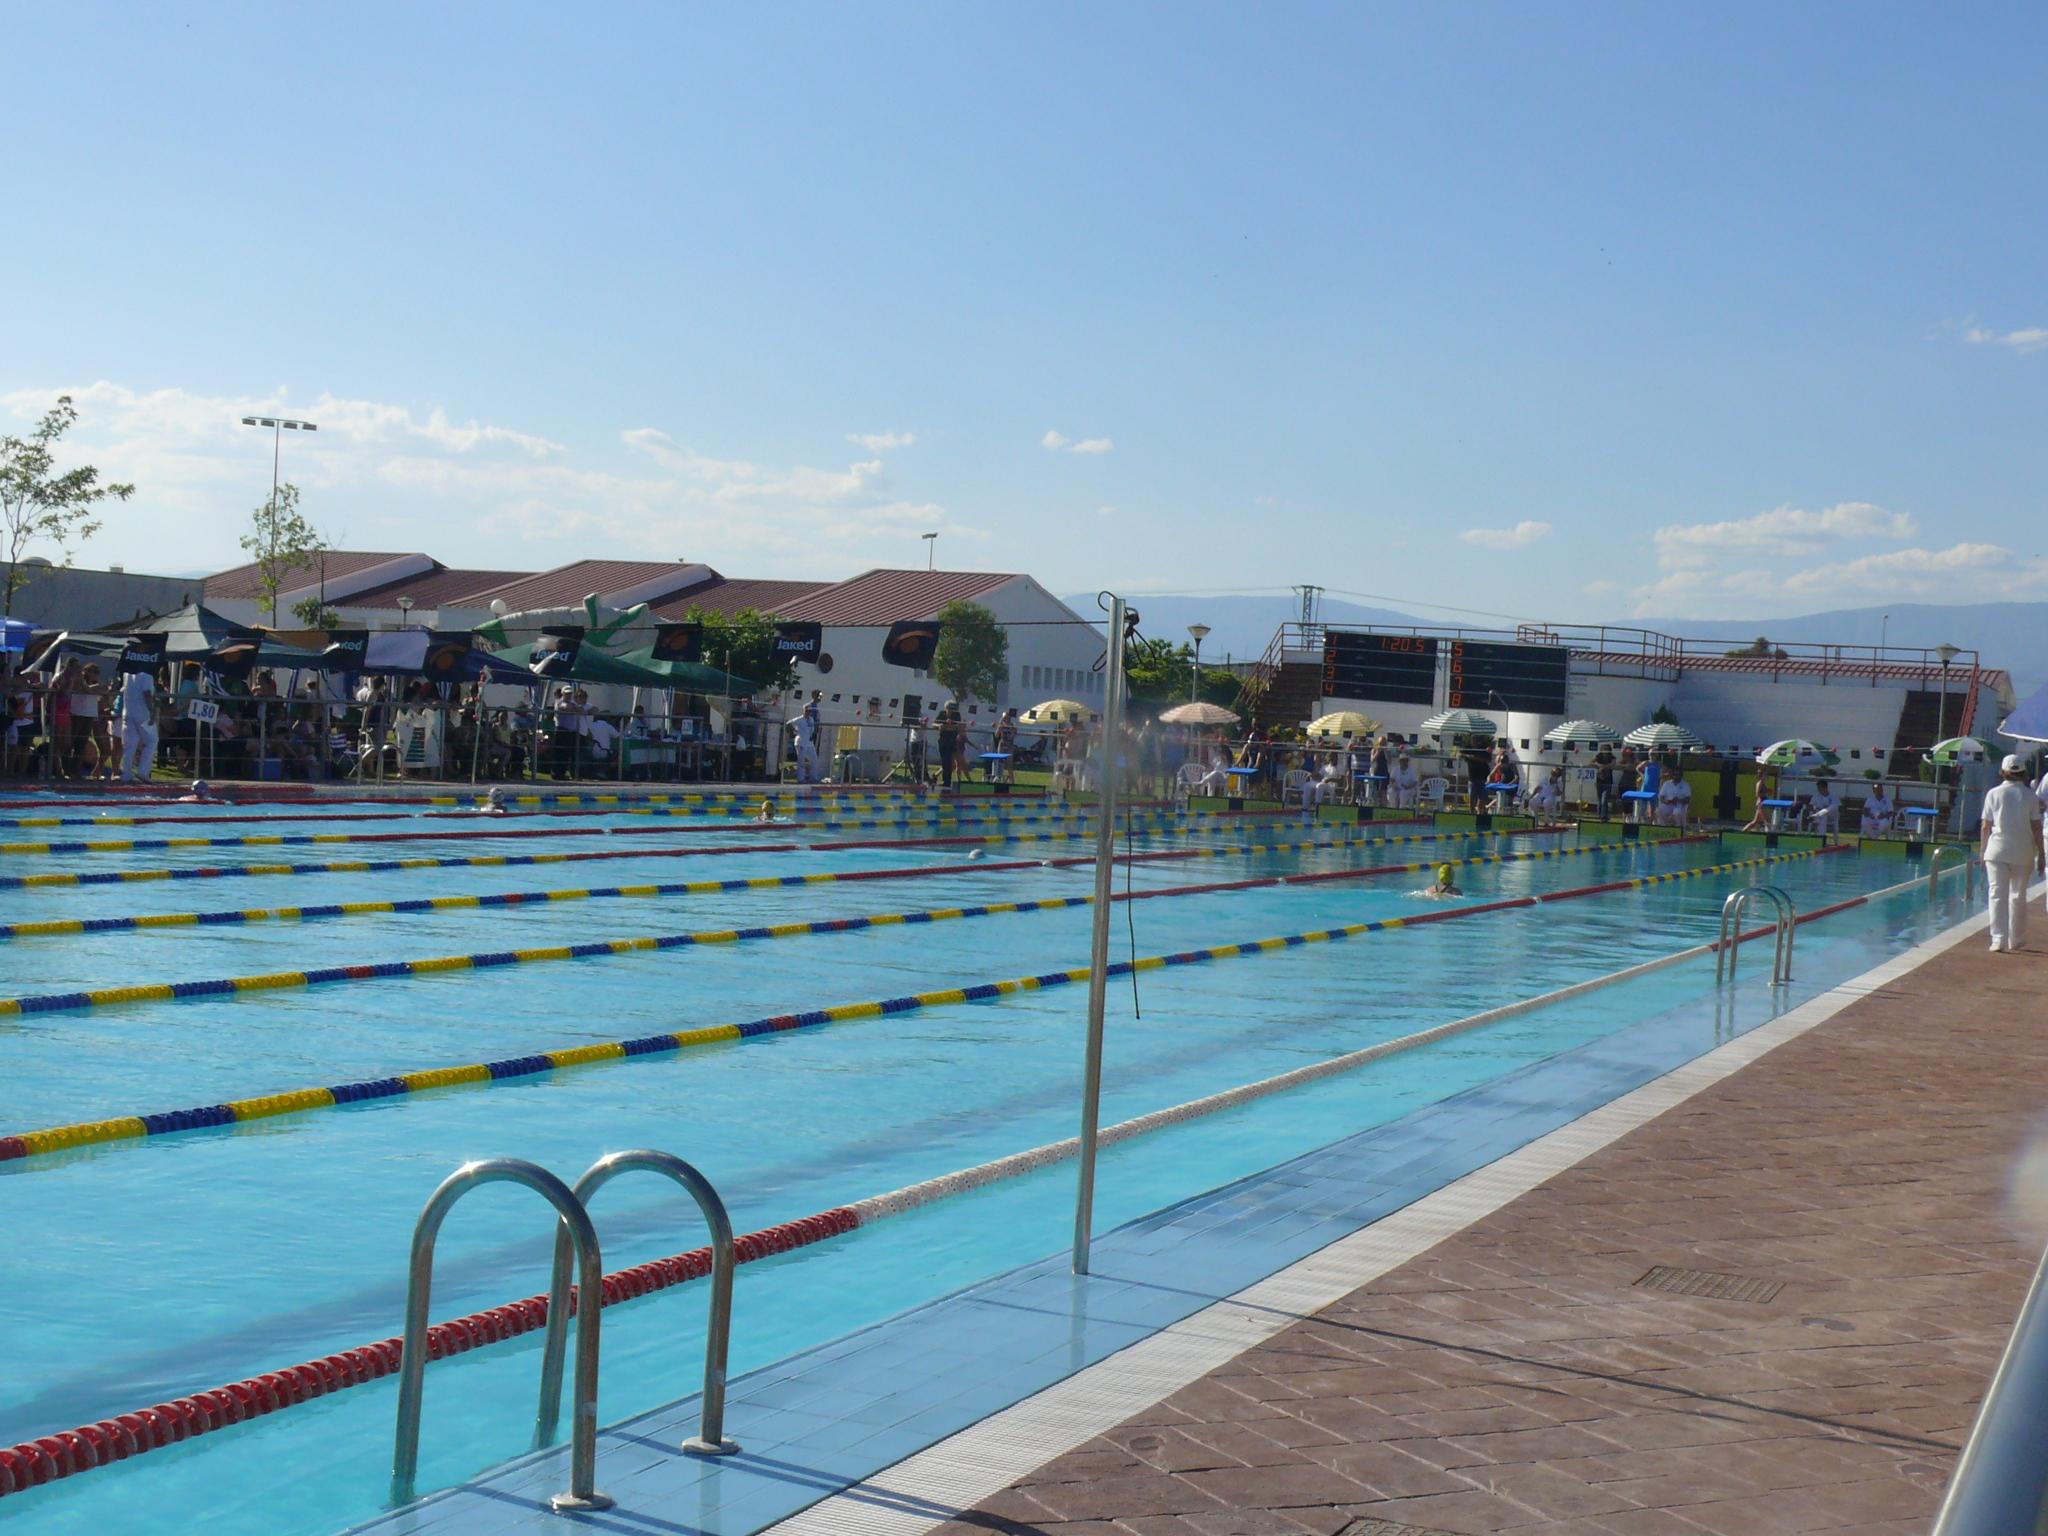 La piscina municipal se estrena con una jornada de puertas for Piscinas naturales navalmoral dela mata